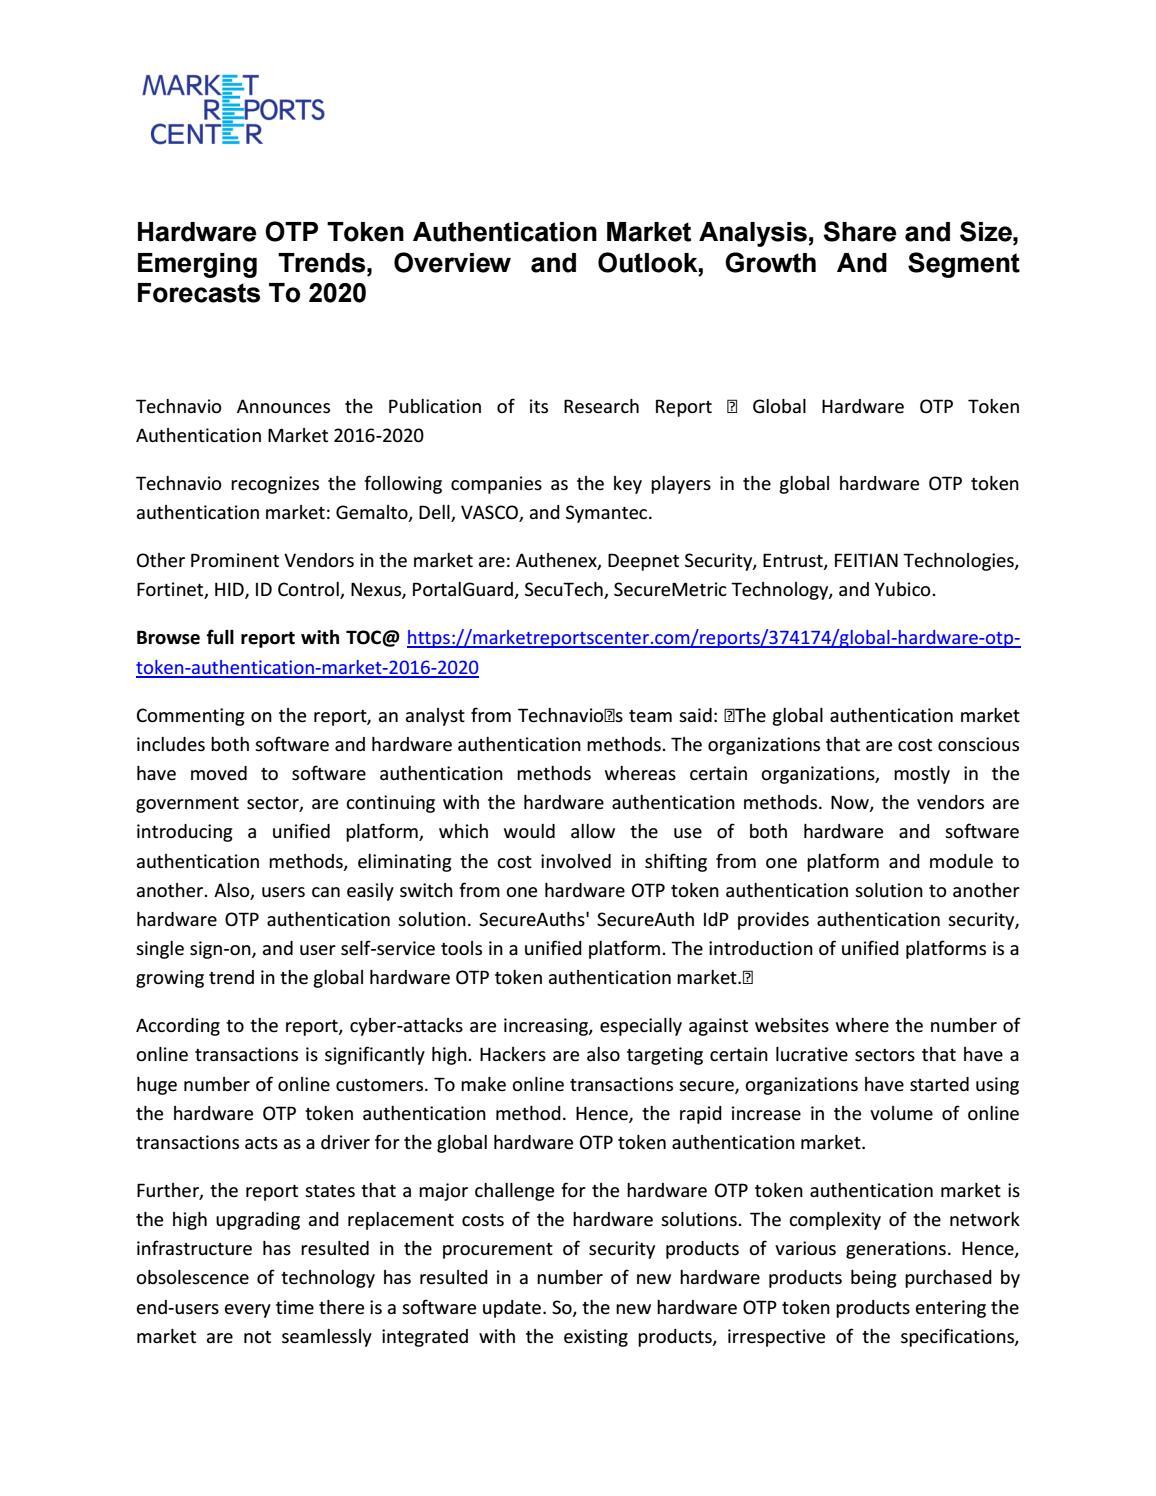 Hardware OTP Token Authentication Market Share, Size, Trends